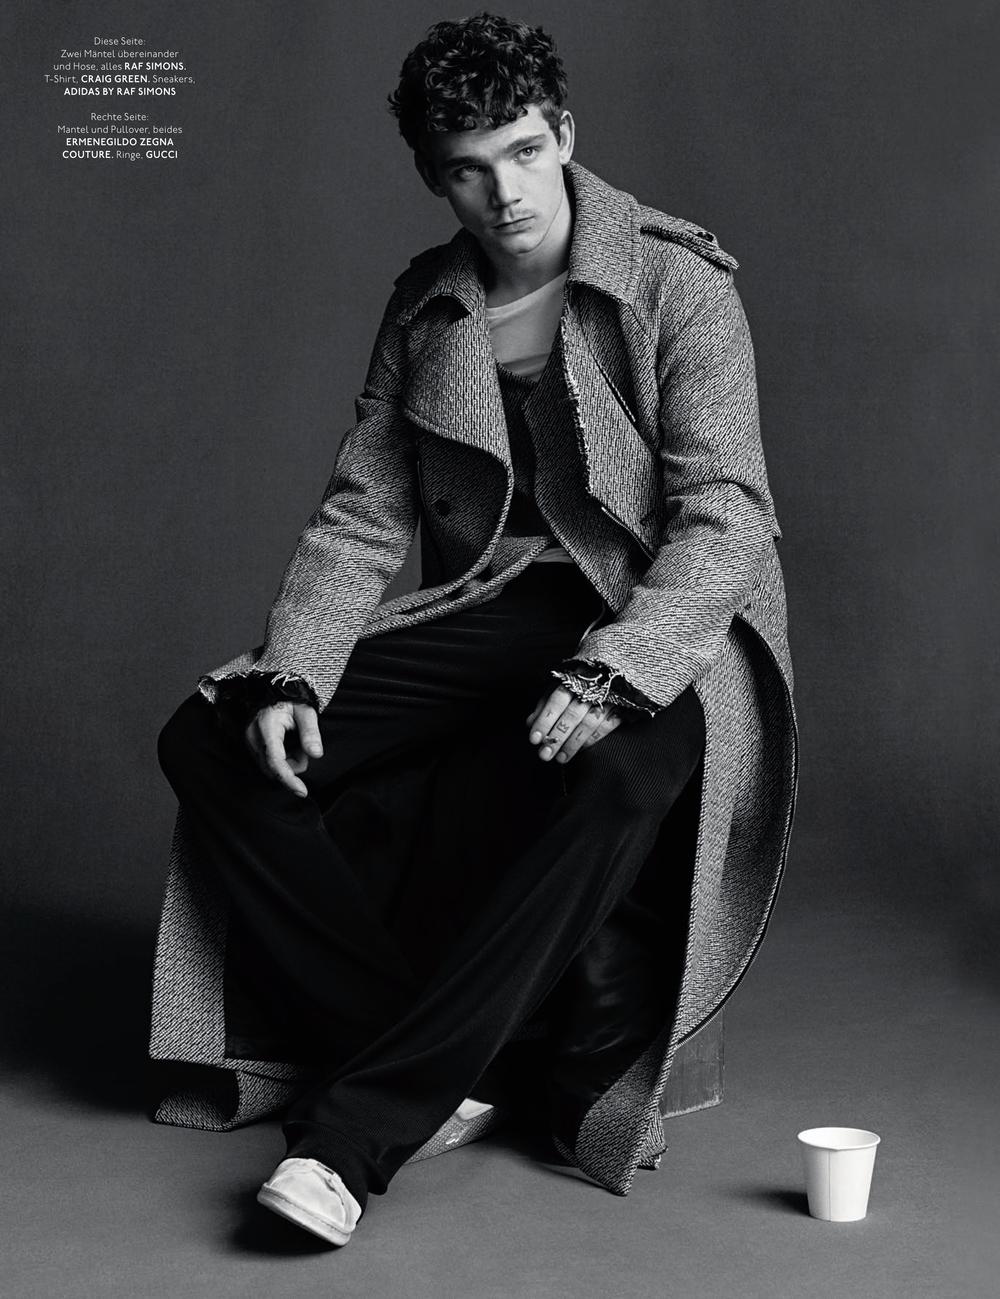 GQ Style Germany, SS 15 - Ben Weller-2.jpg